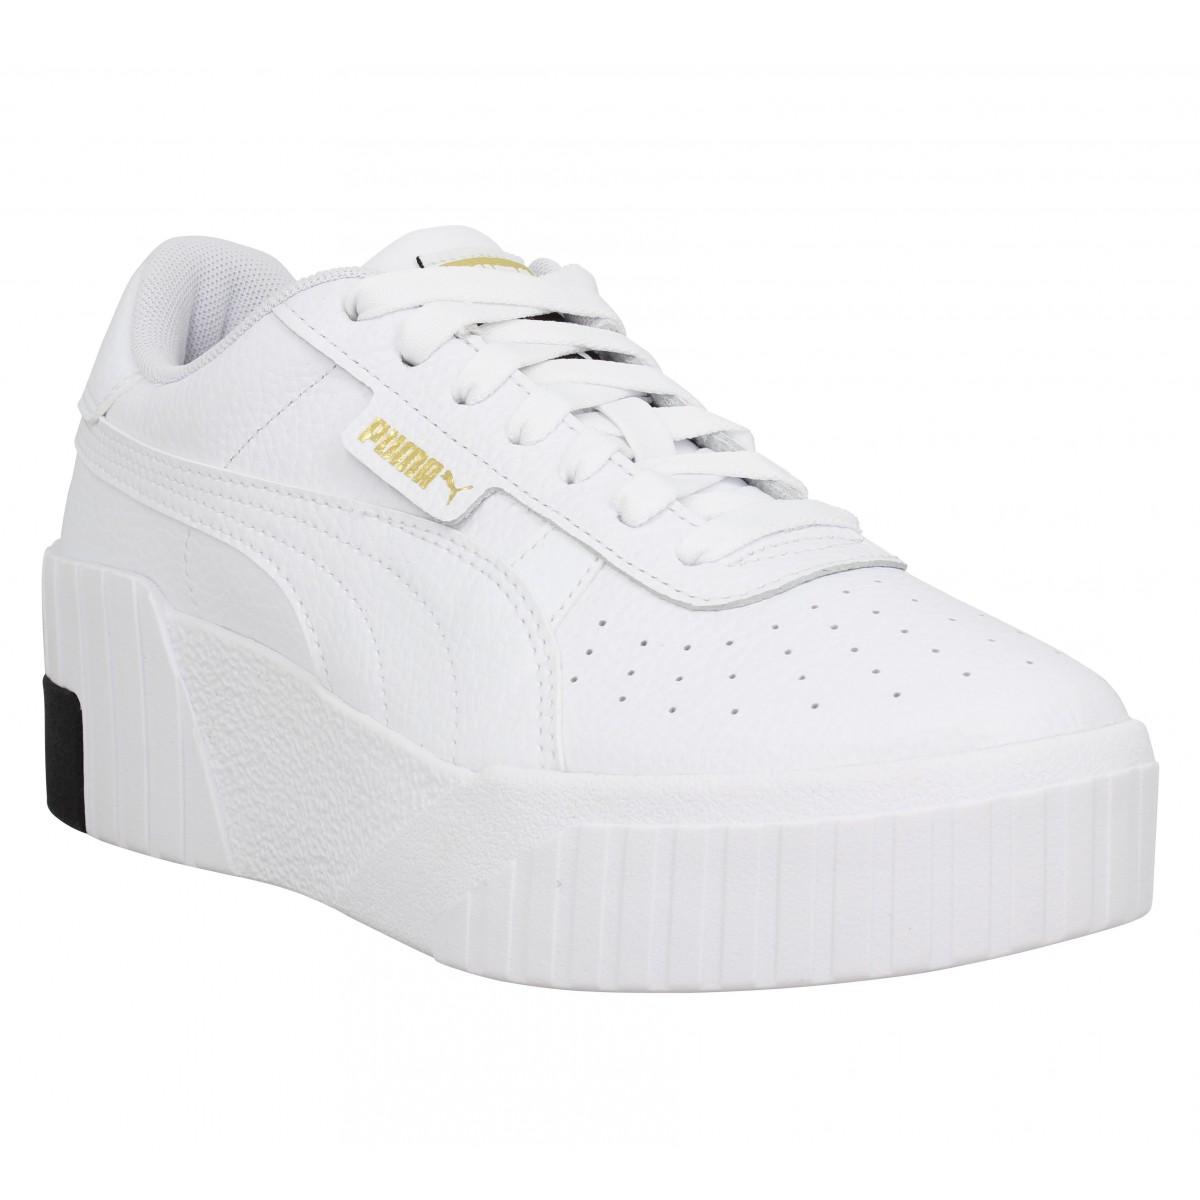 Chaussures Puma cali wedge cuir femme blanc femme | Fanny chaussures